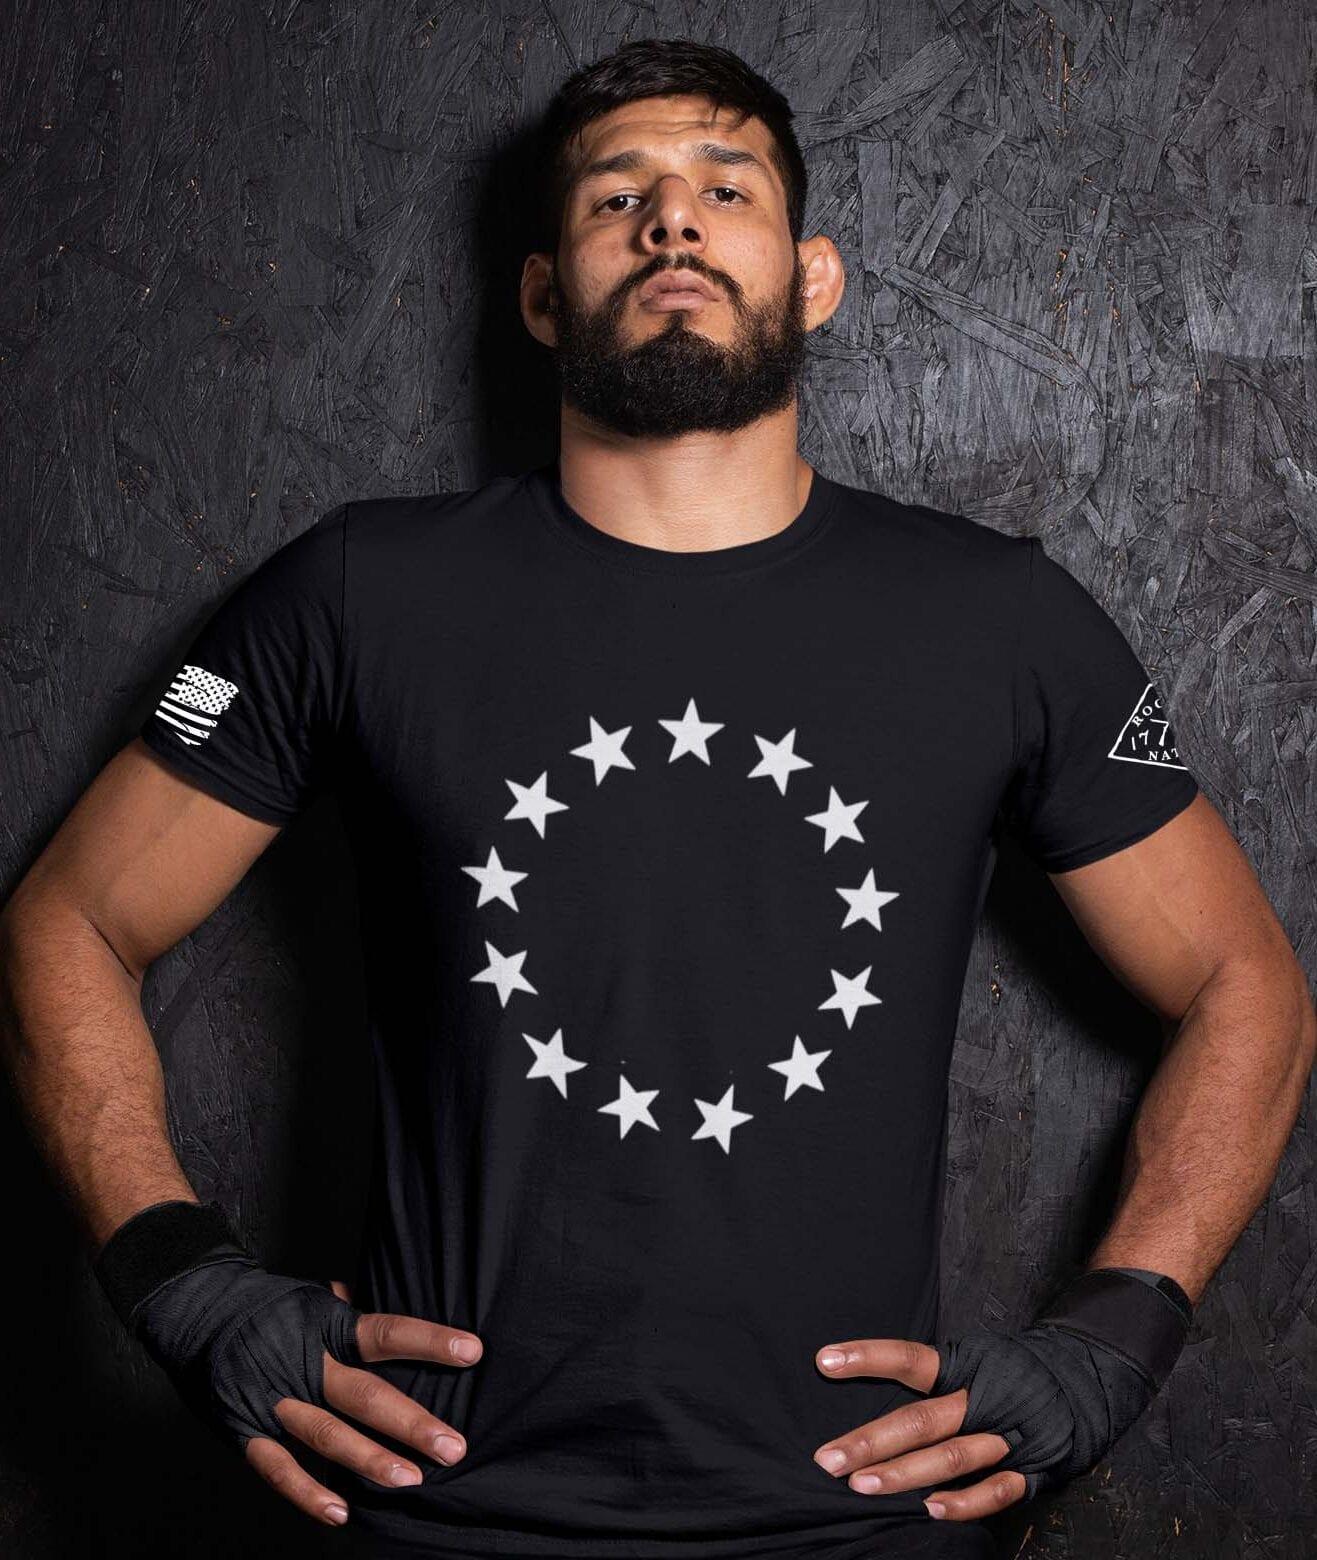 Betsy Stars on a Men's black t-shirt